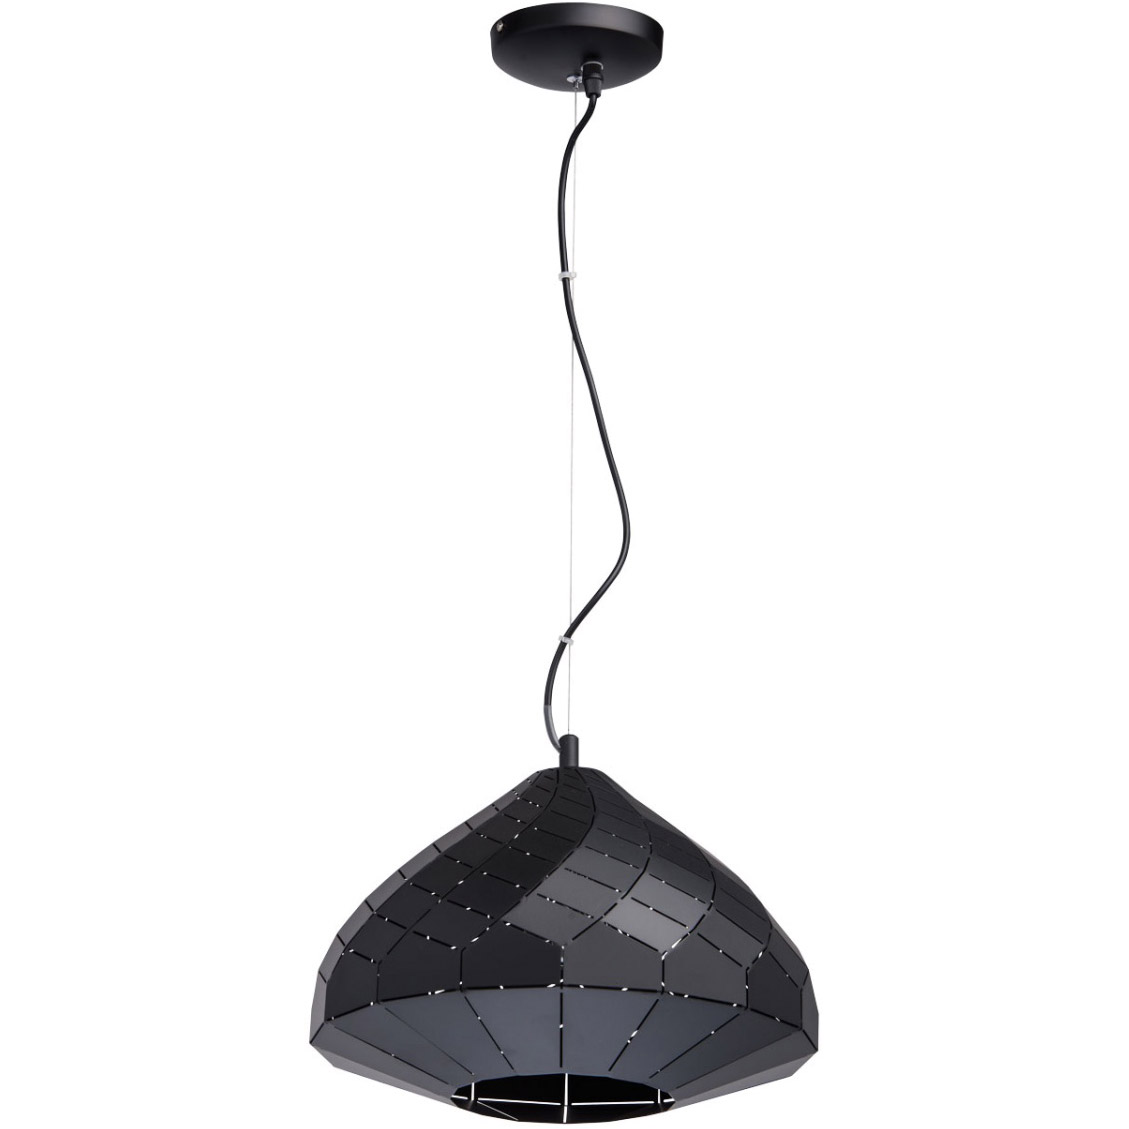 Metalowa Lampa Wiszaca Do Jadalni Regenbogen Loft Czarna Sklep